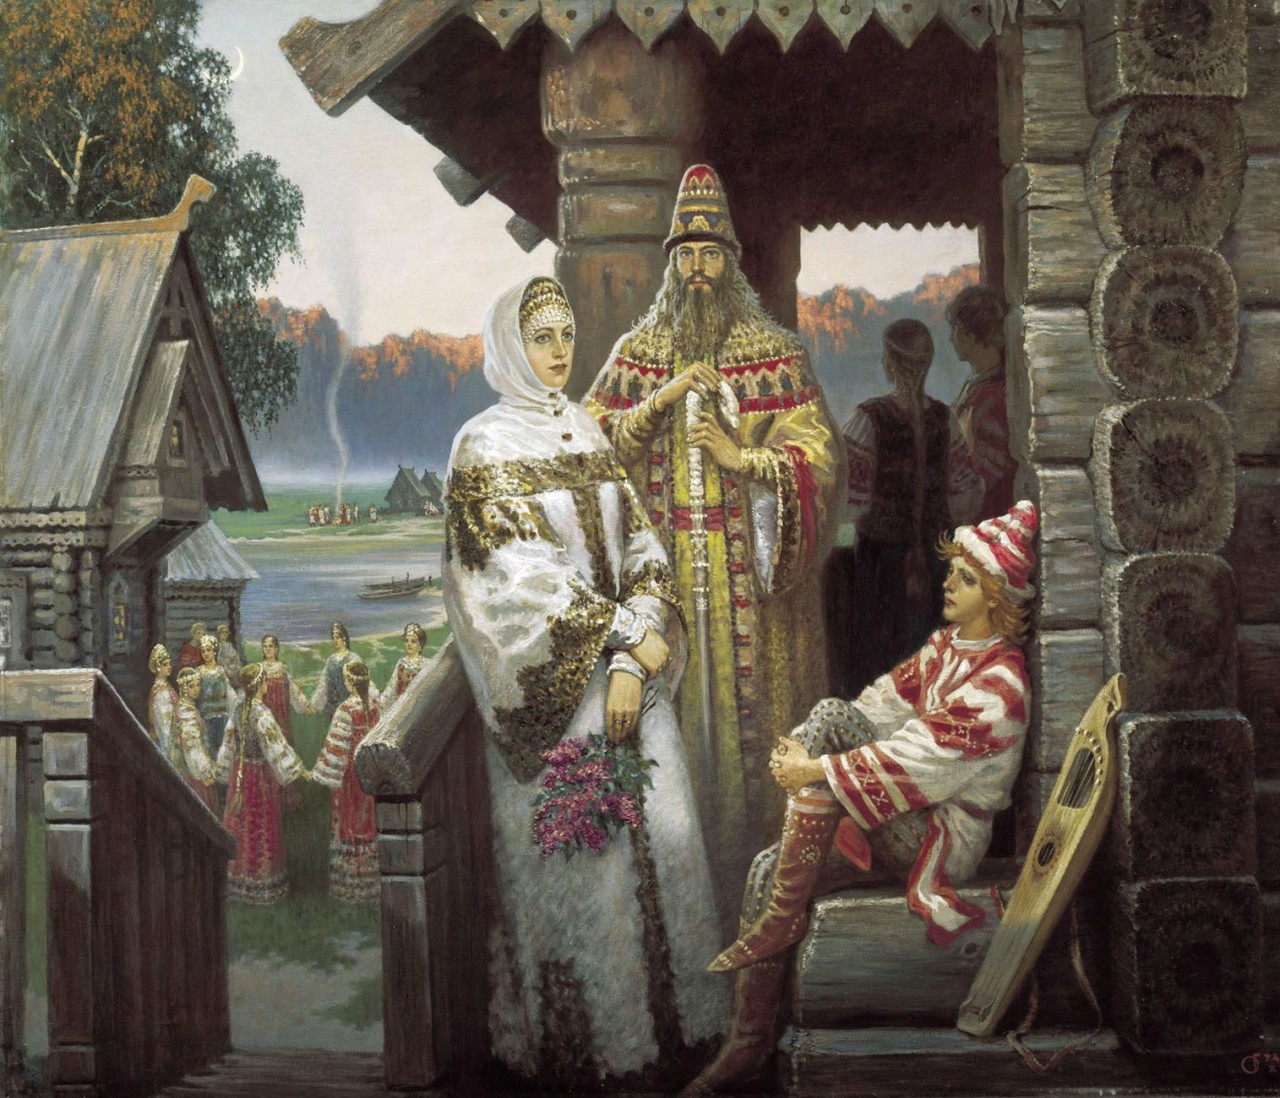 Советское государство имеет глубокие славянские корни.